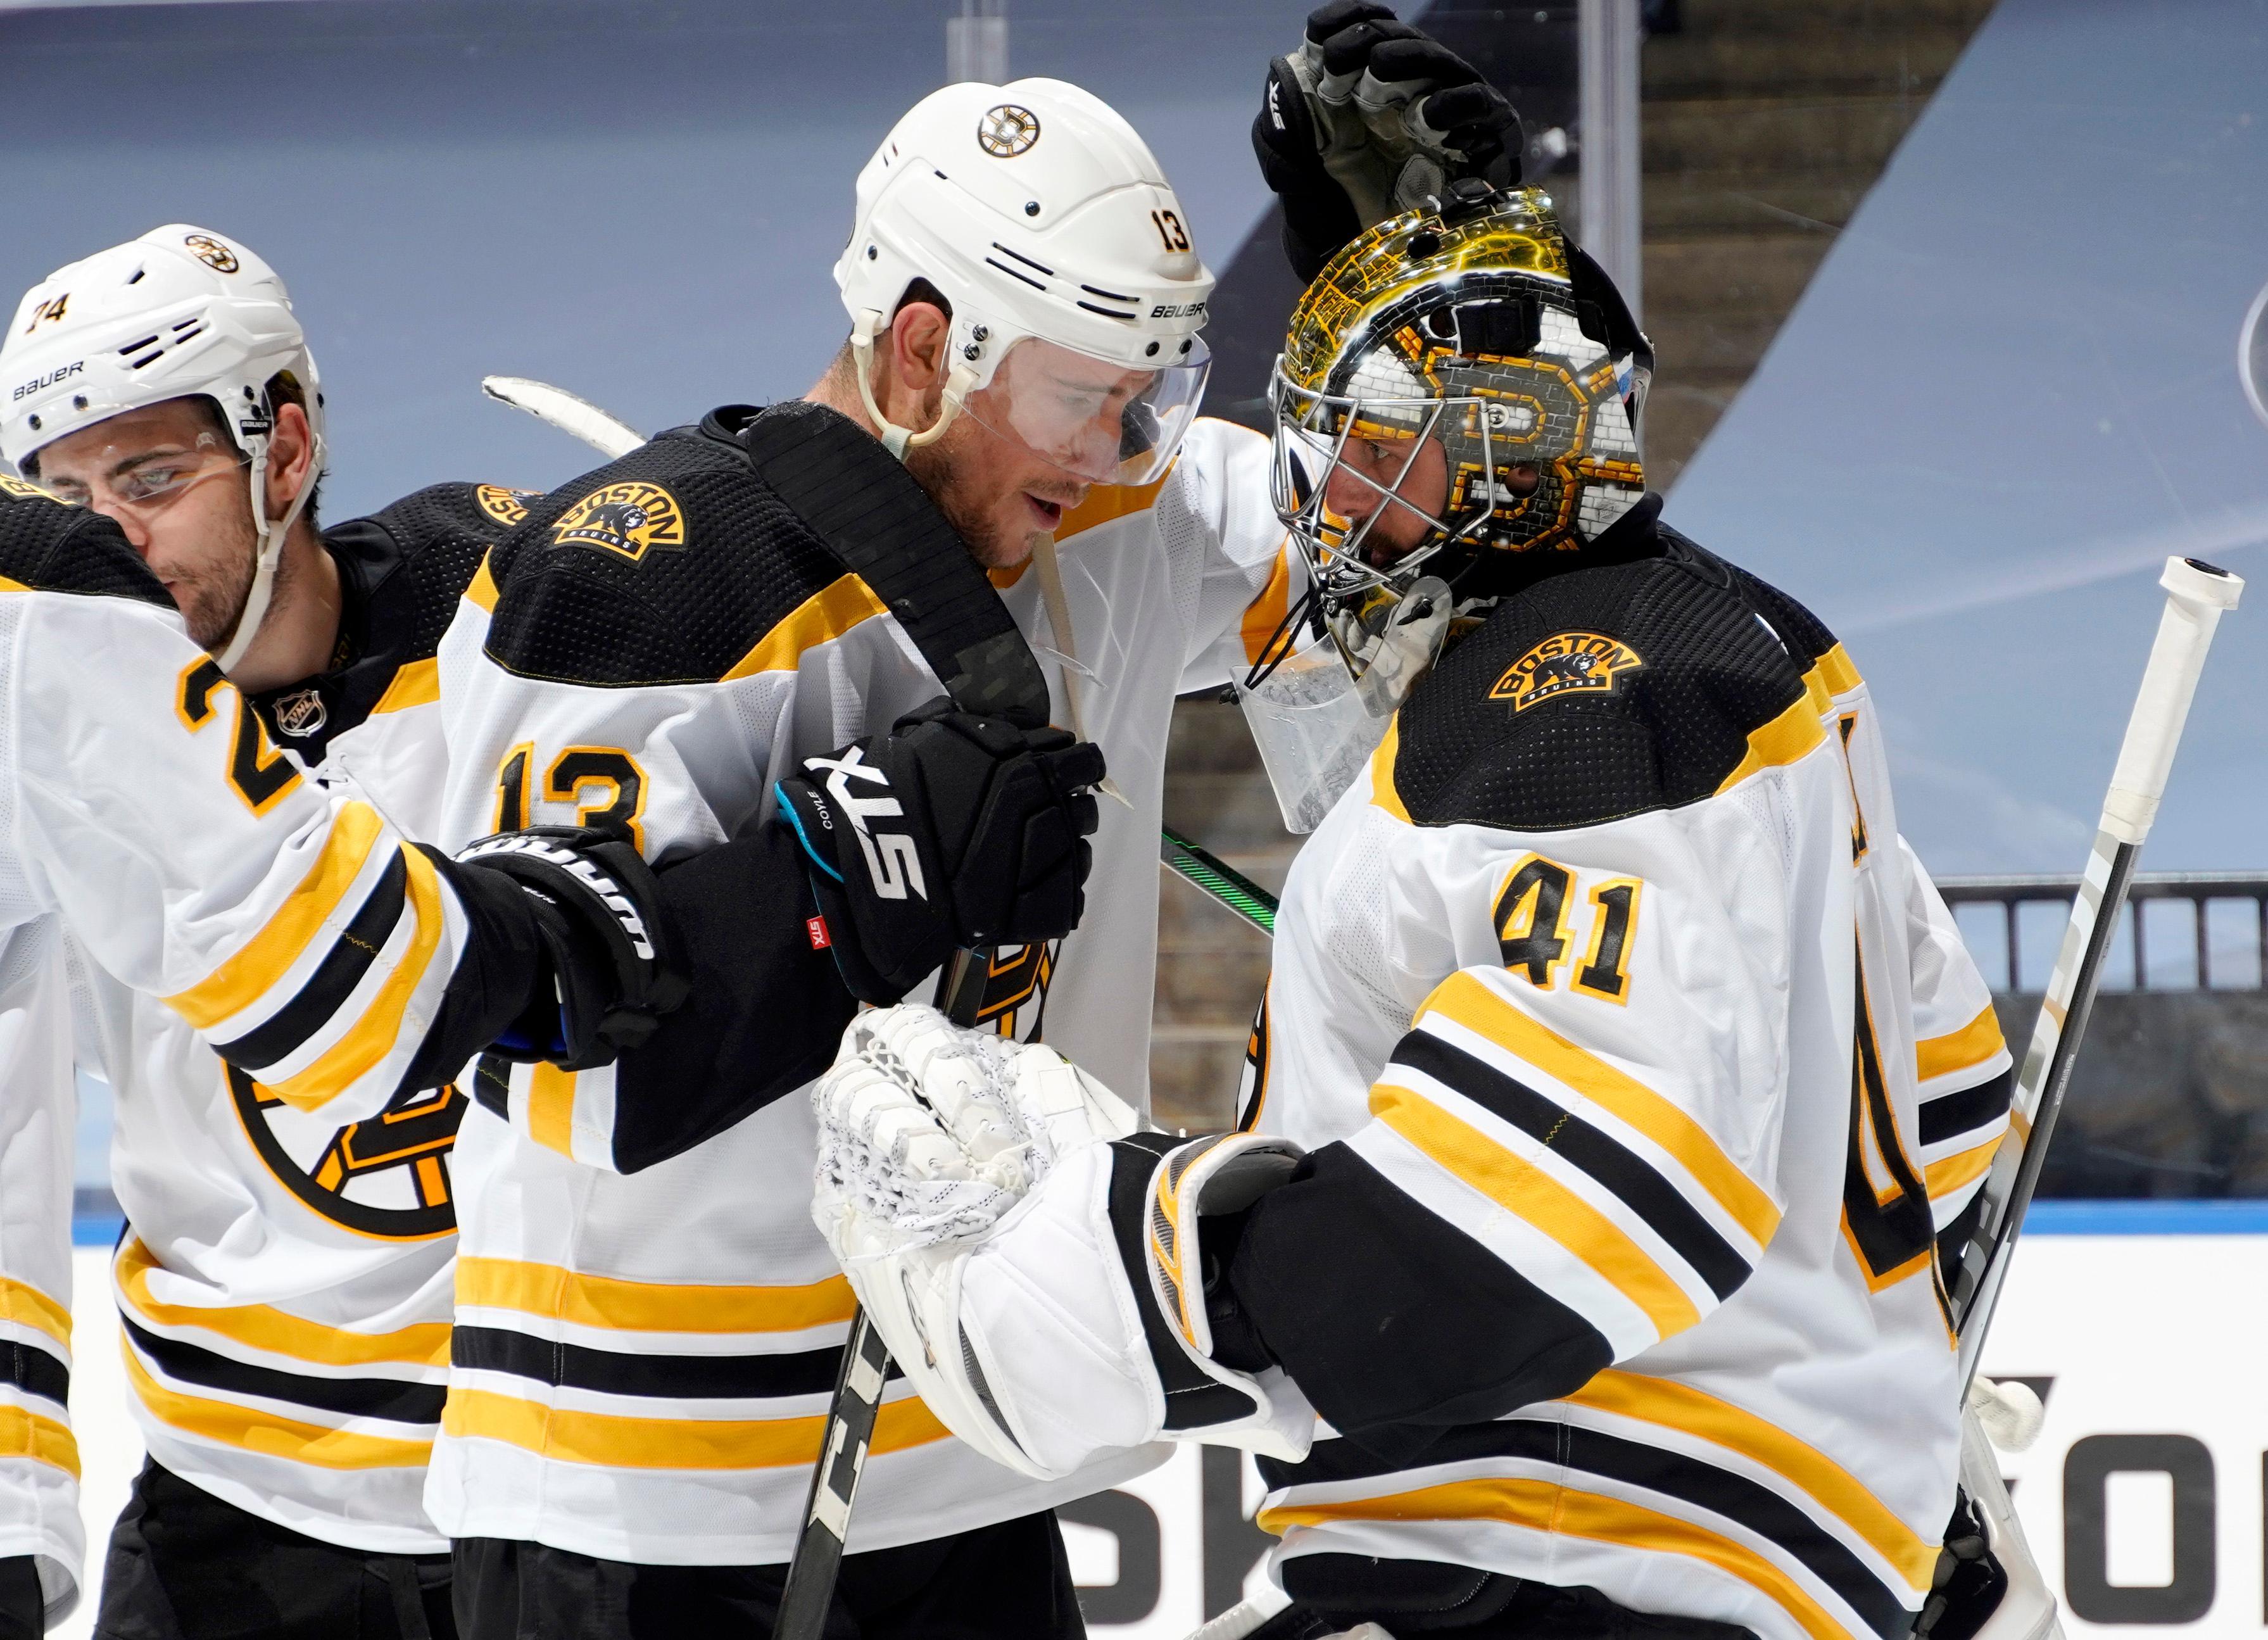 Фото © Twitter / Boston Bruins